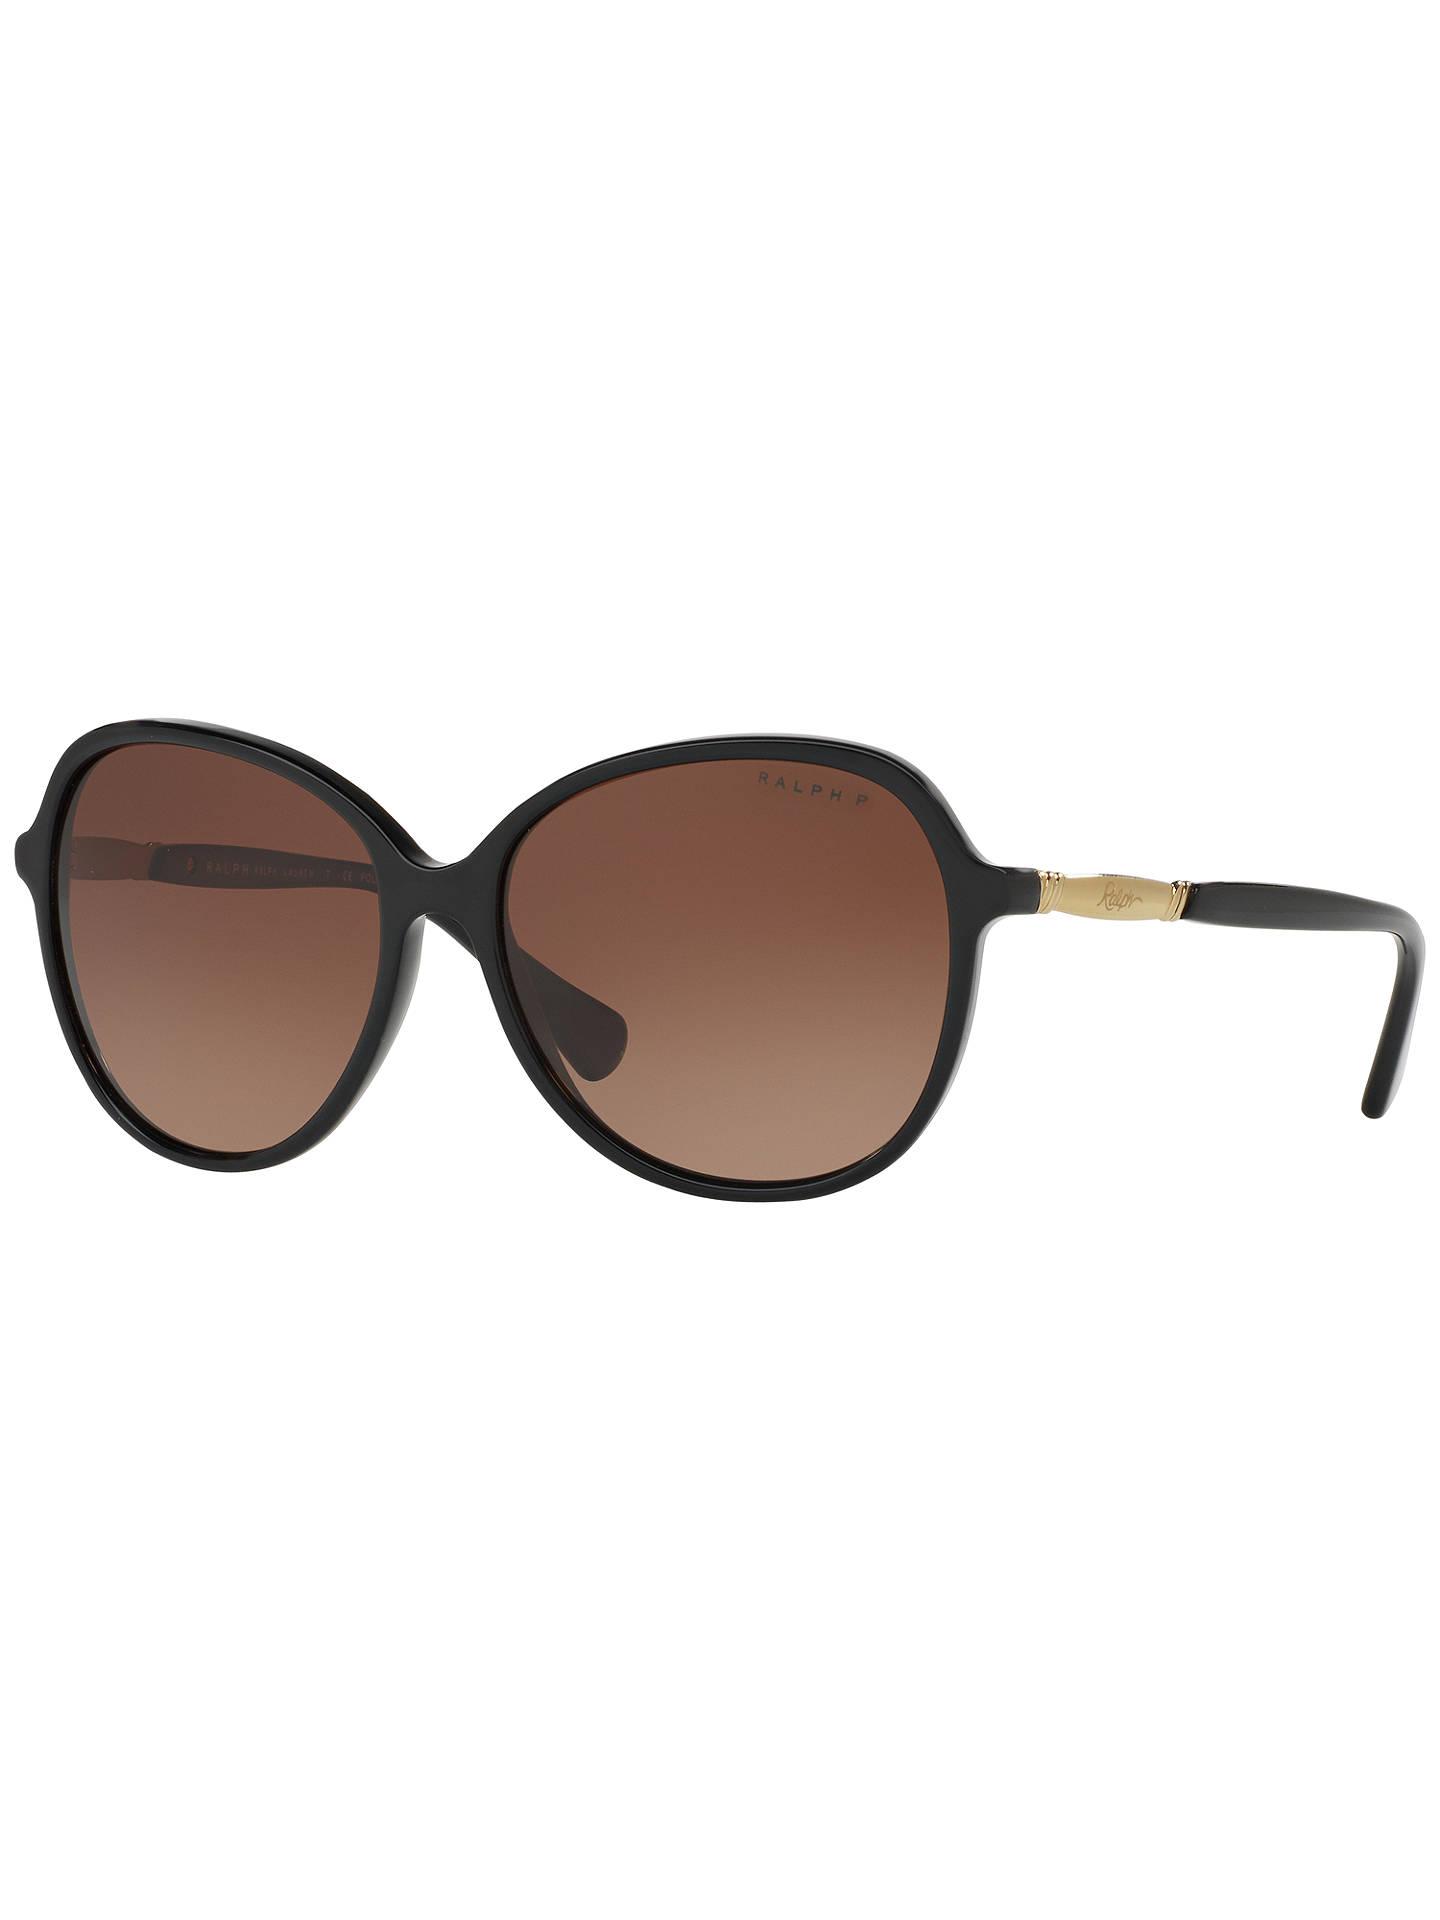 bc6a9ad1417c Buy Ralph RA5220 Women's Polarised Oversize Square Sunglasses, Matte  Black/Brown Gradient Online at ...